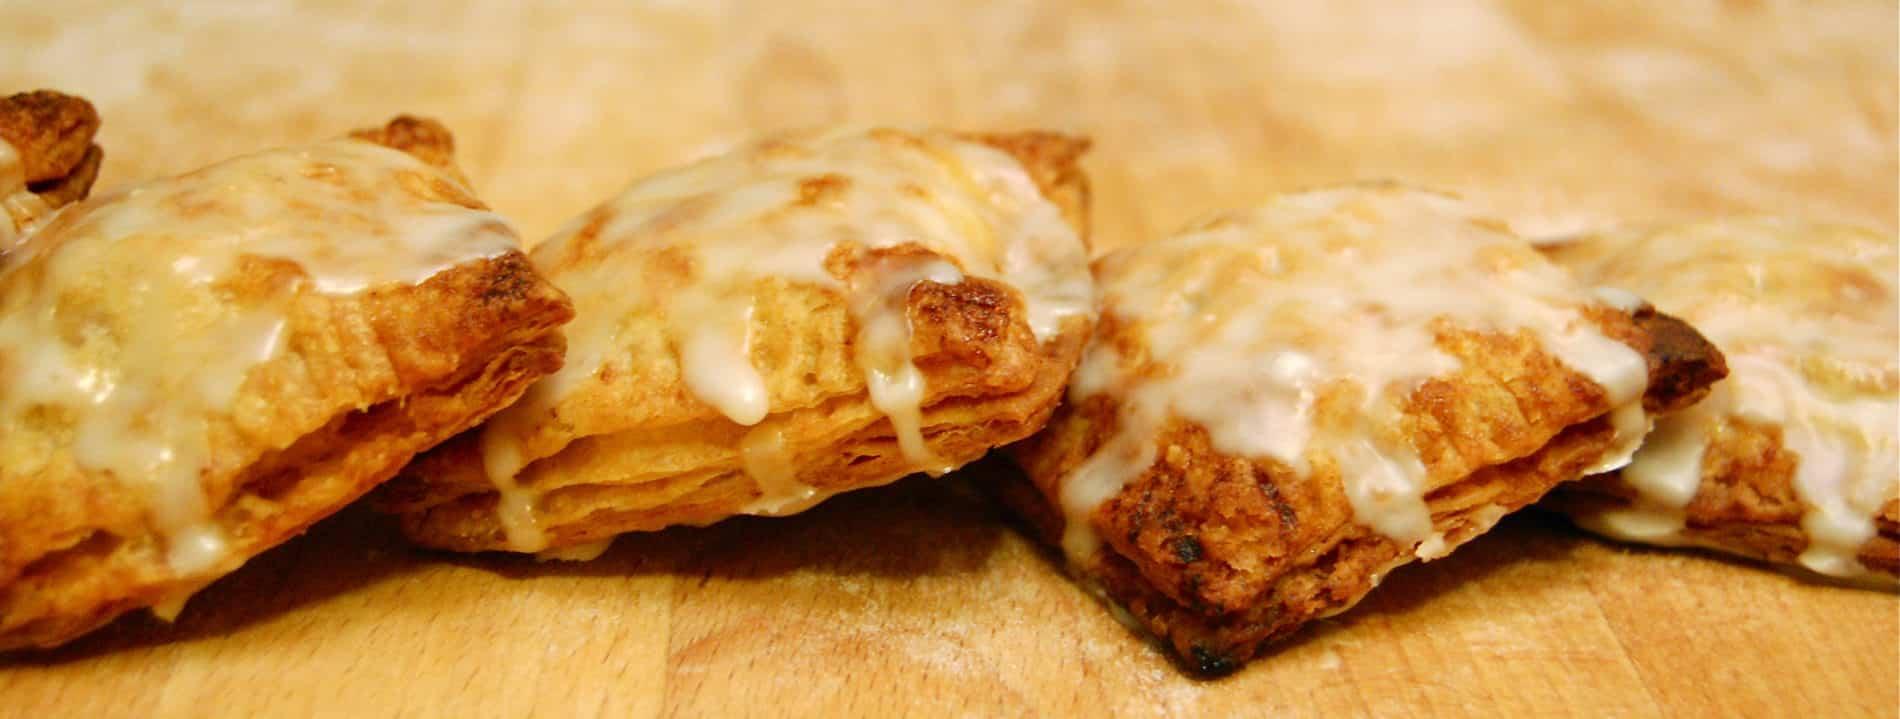 thanksgiving leftover breakfast ideas